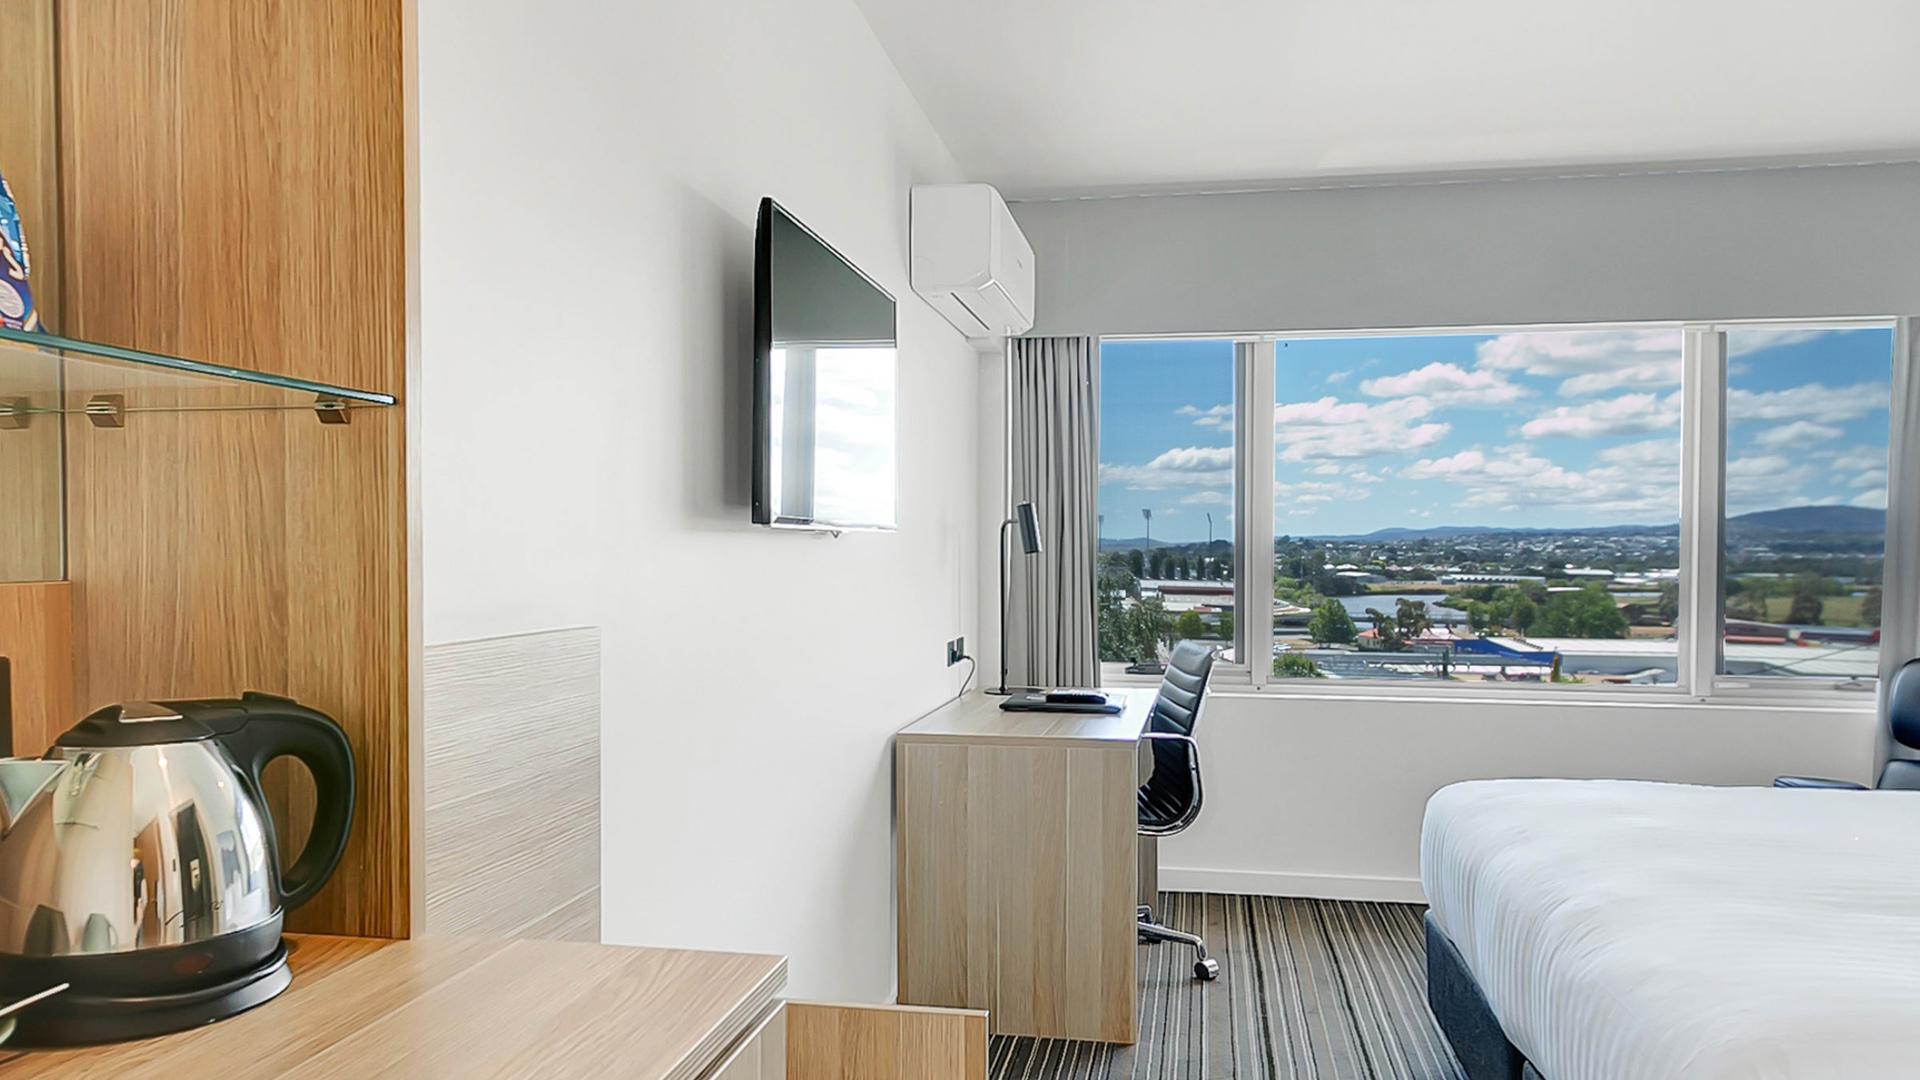 Superior Queen Room image 1 at Mercure Launceston by Launceston City Council, Tasmania, Australia